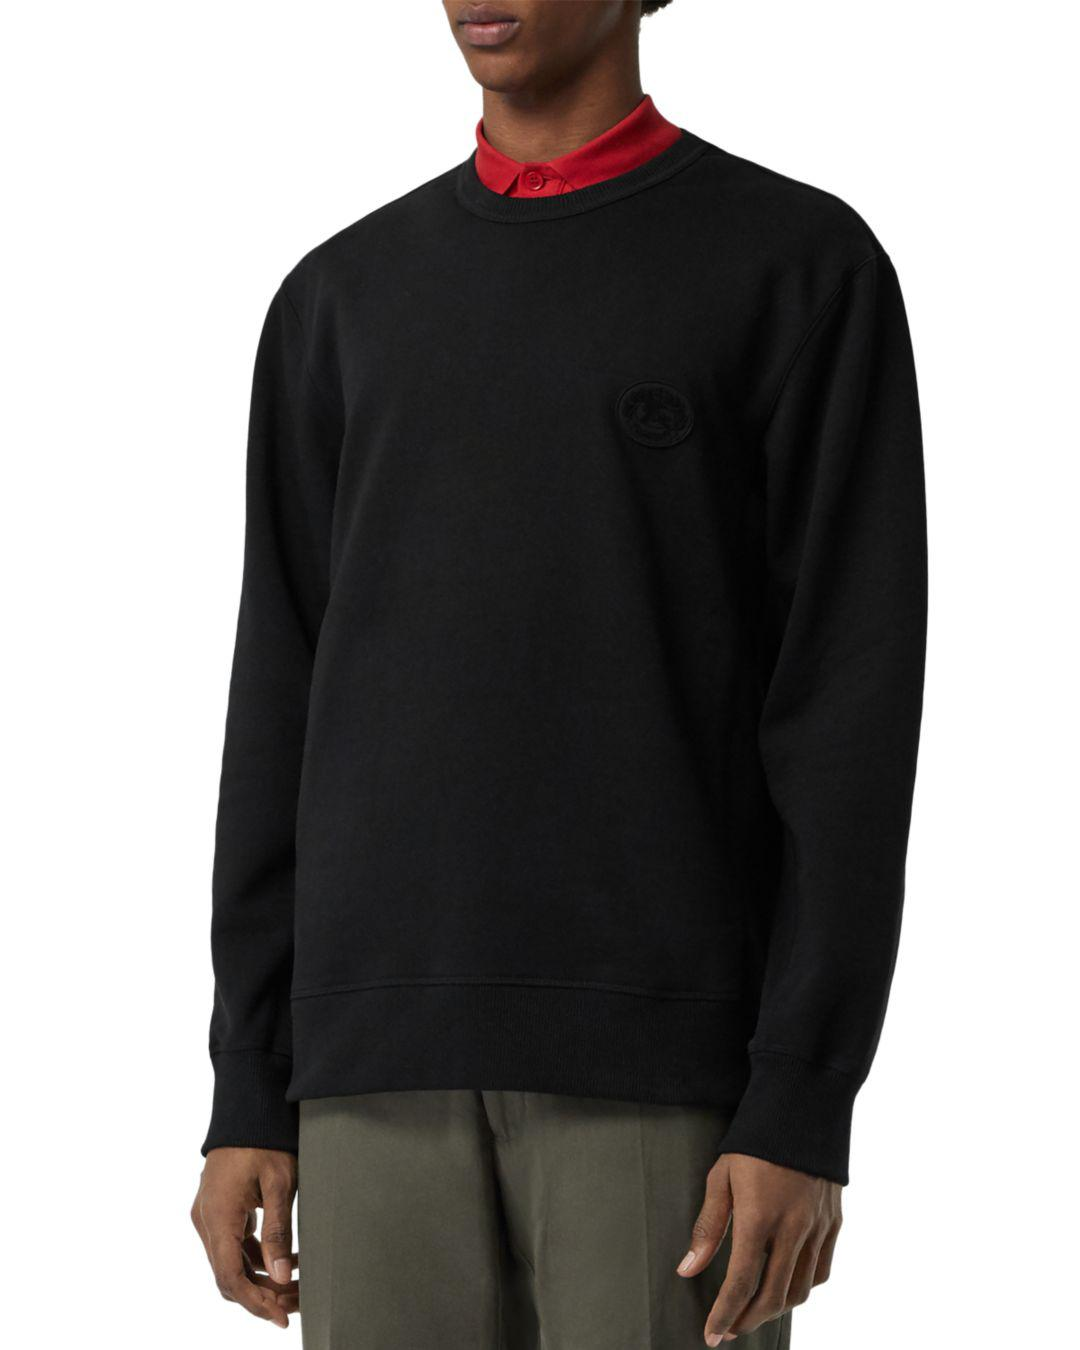 b2141306a803 Lyst - Burberry Jayford Embroidered Logo Sweatshirt in Black for Men